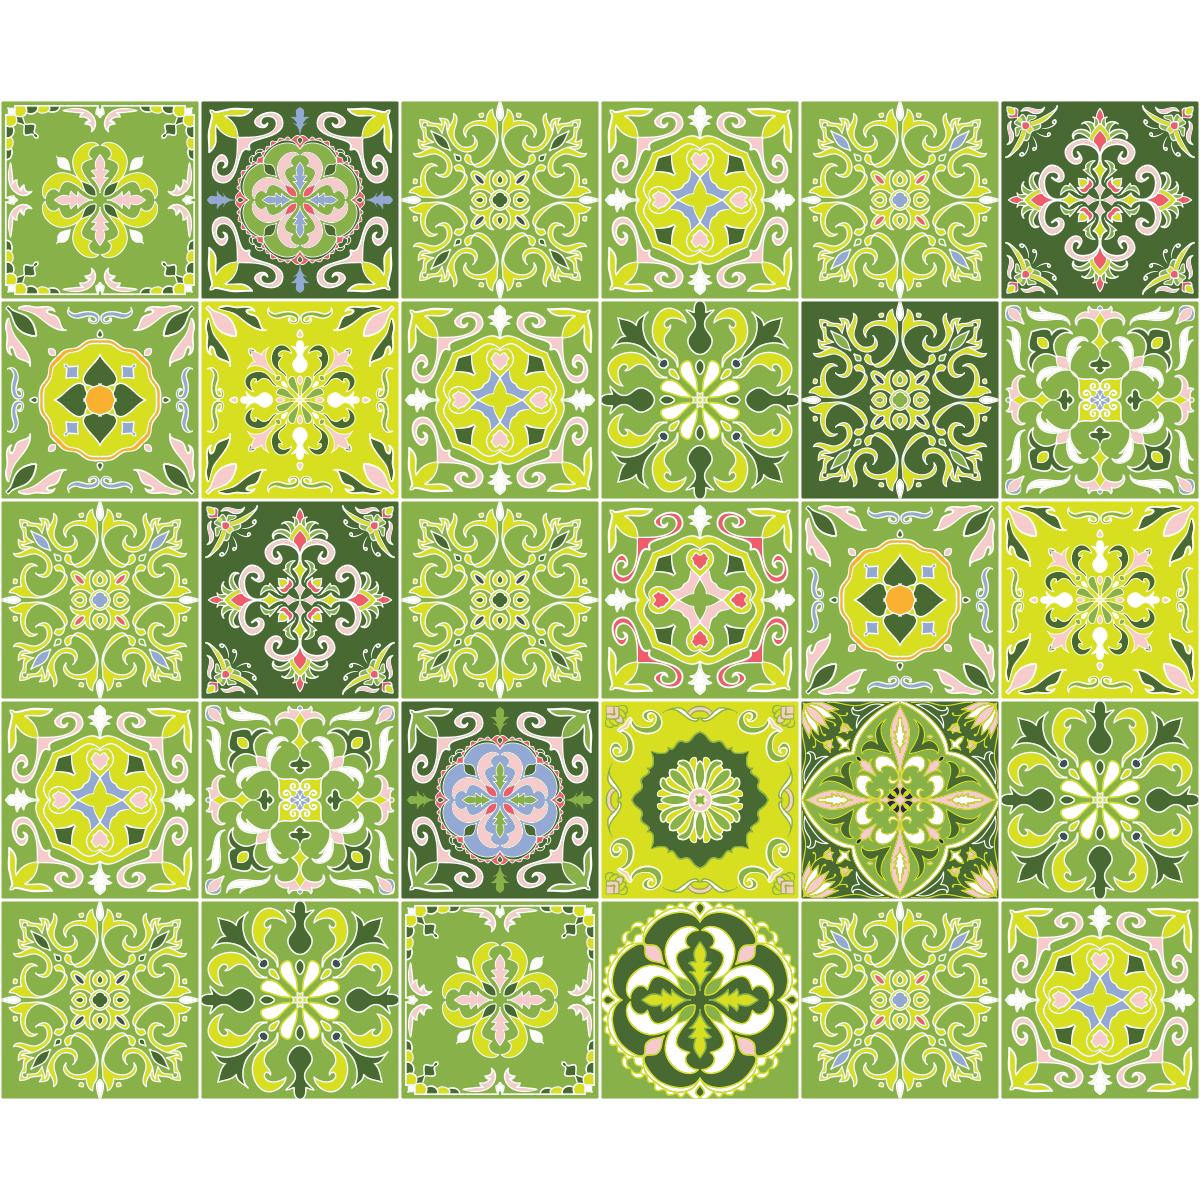 30 stickers carrelages azulejos bilbao art et design artistiques ambiance sticker. Black Bedroom Furniture Sets. Home Design Ideas